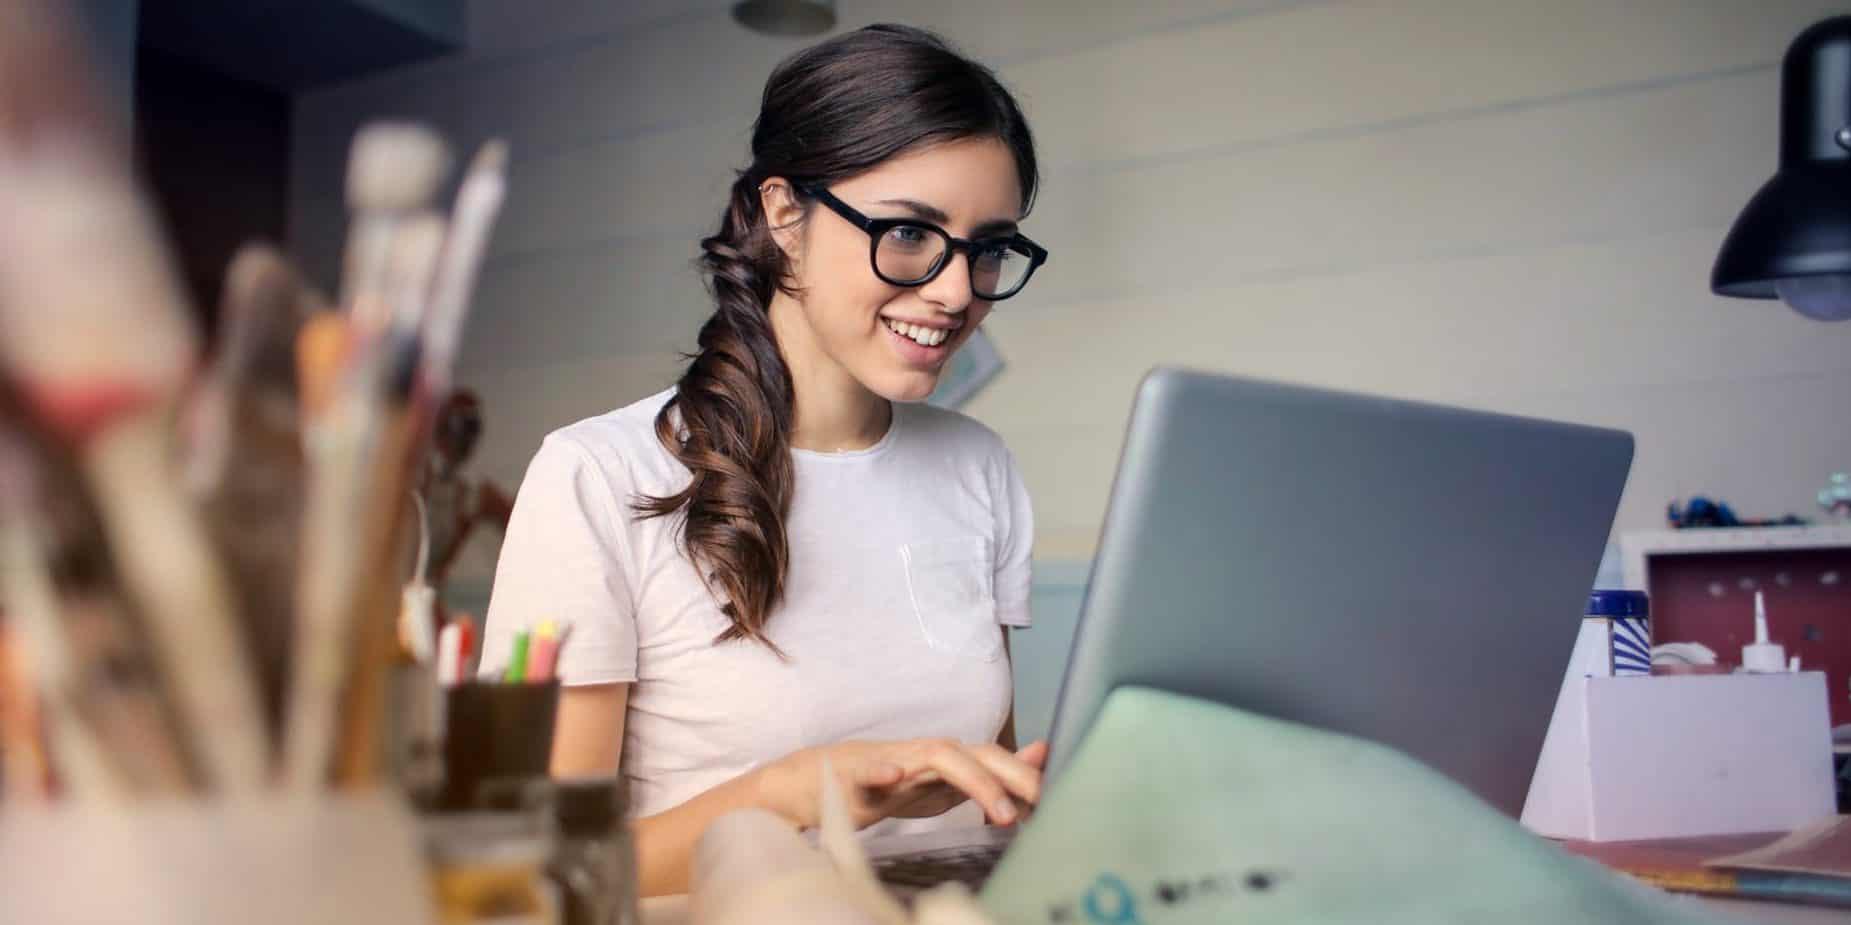 girl on laptop sp